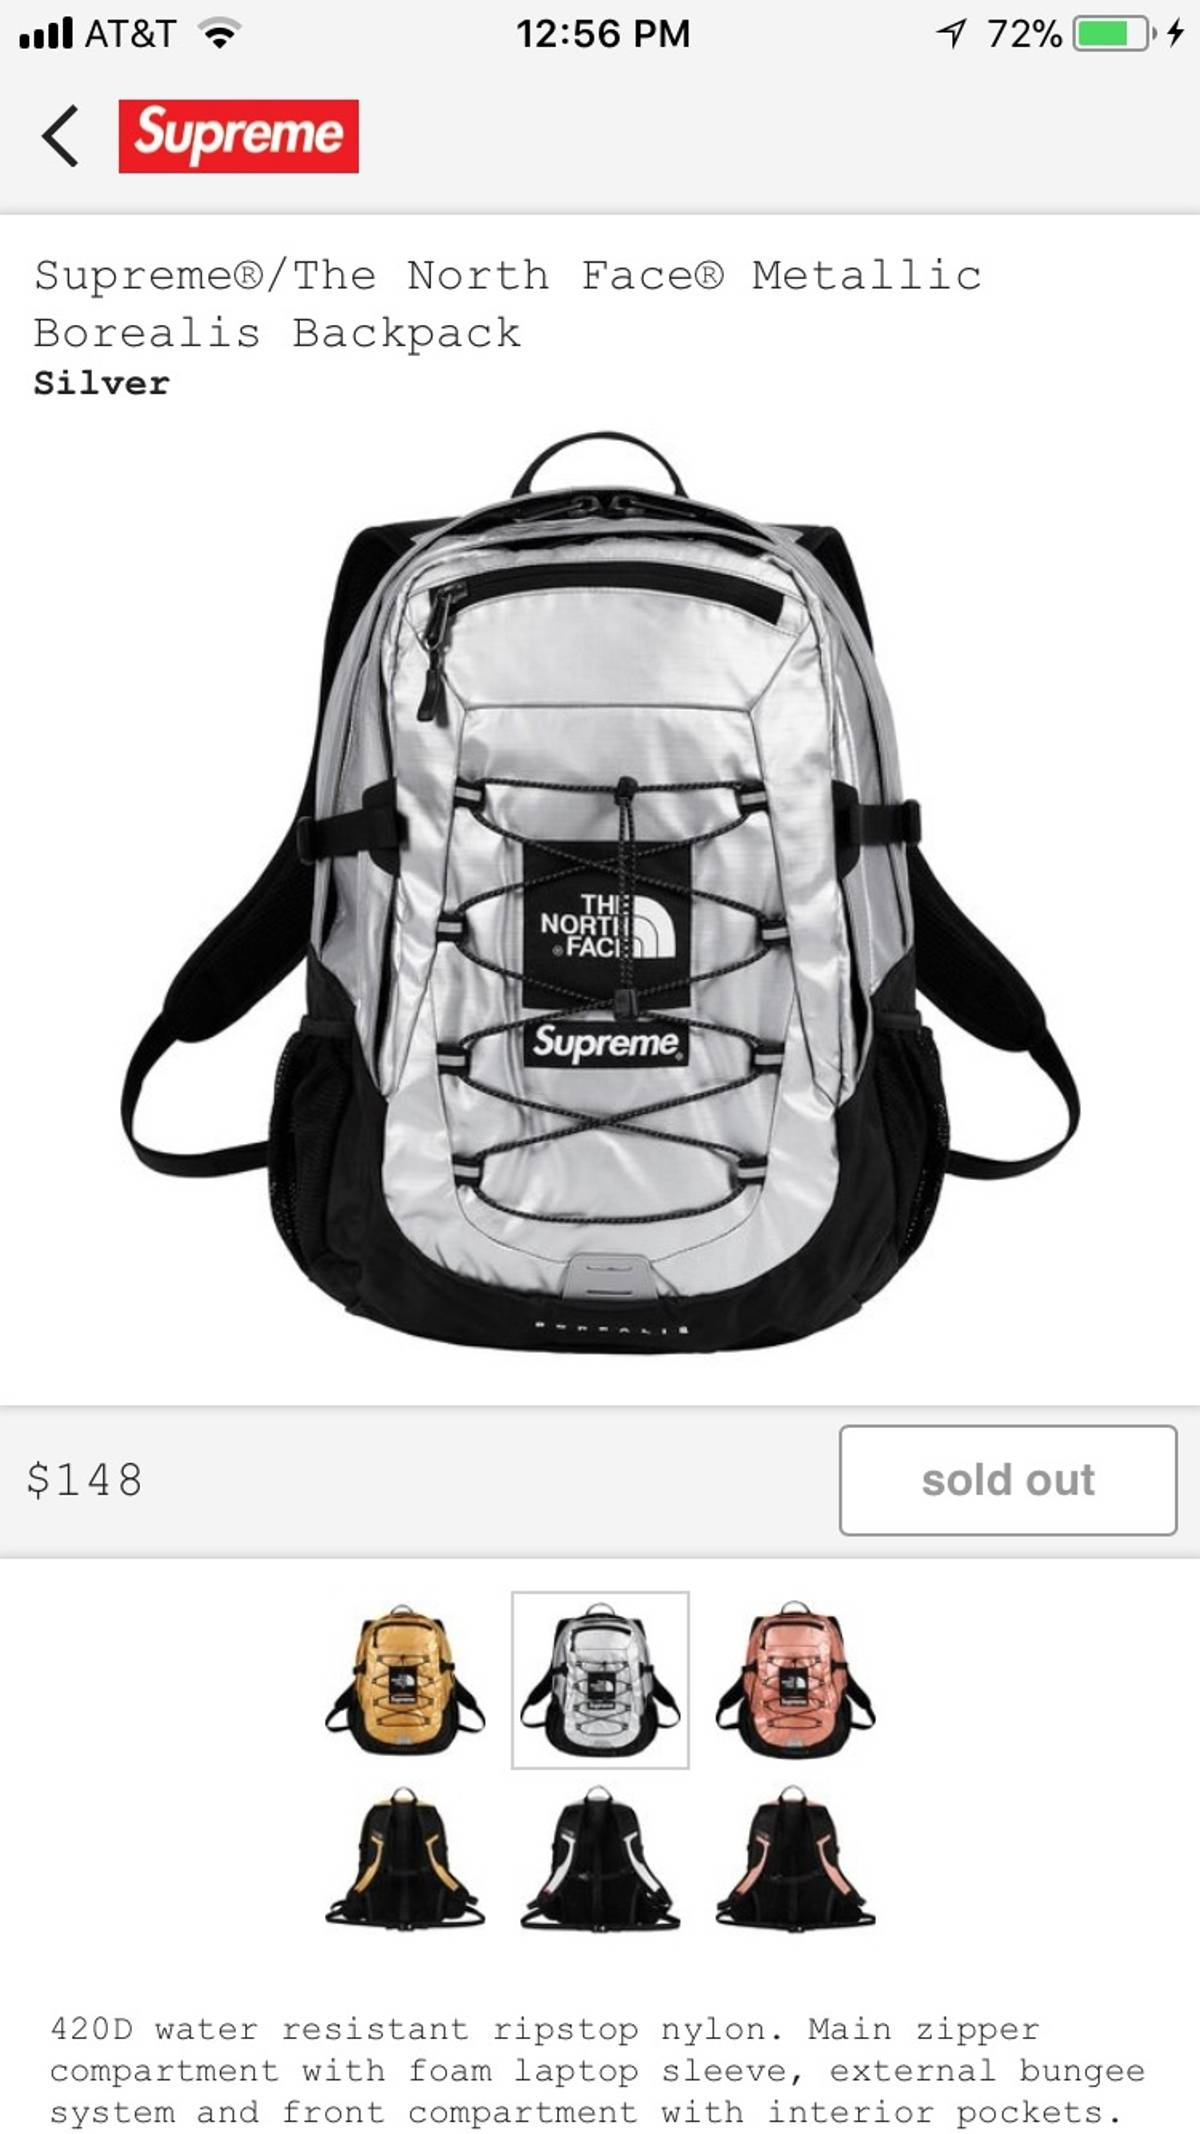 45752079c02 Supreme × The North Face ×. Supreme®/The North Face® Metallic Borealis  Backpack (Silver)